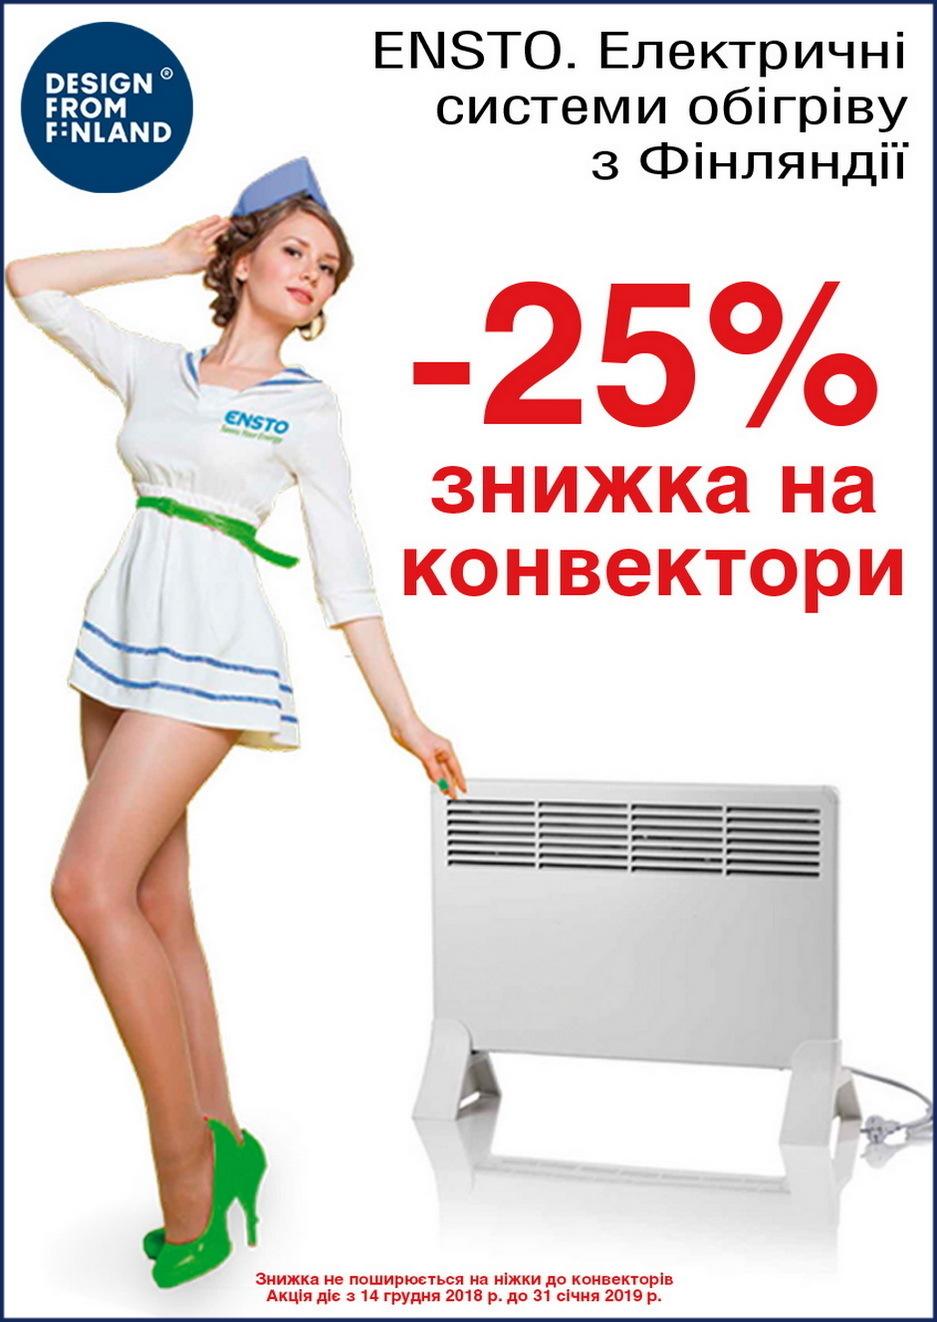 Ensto знижка 25%